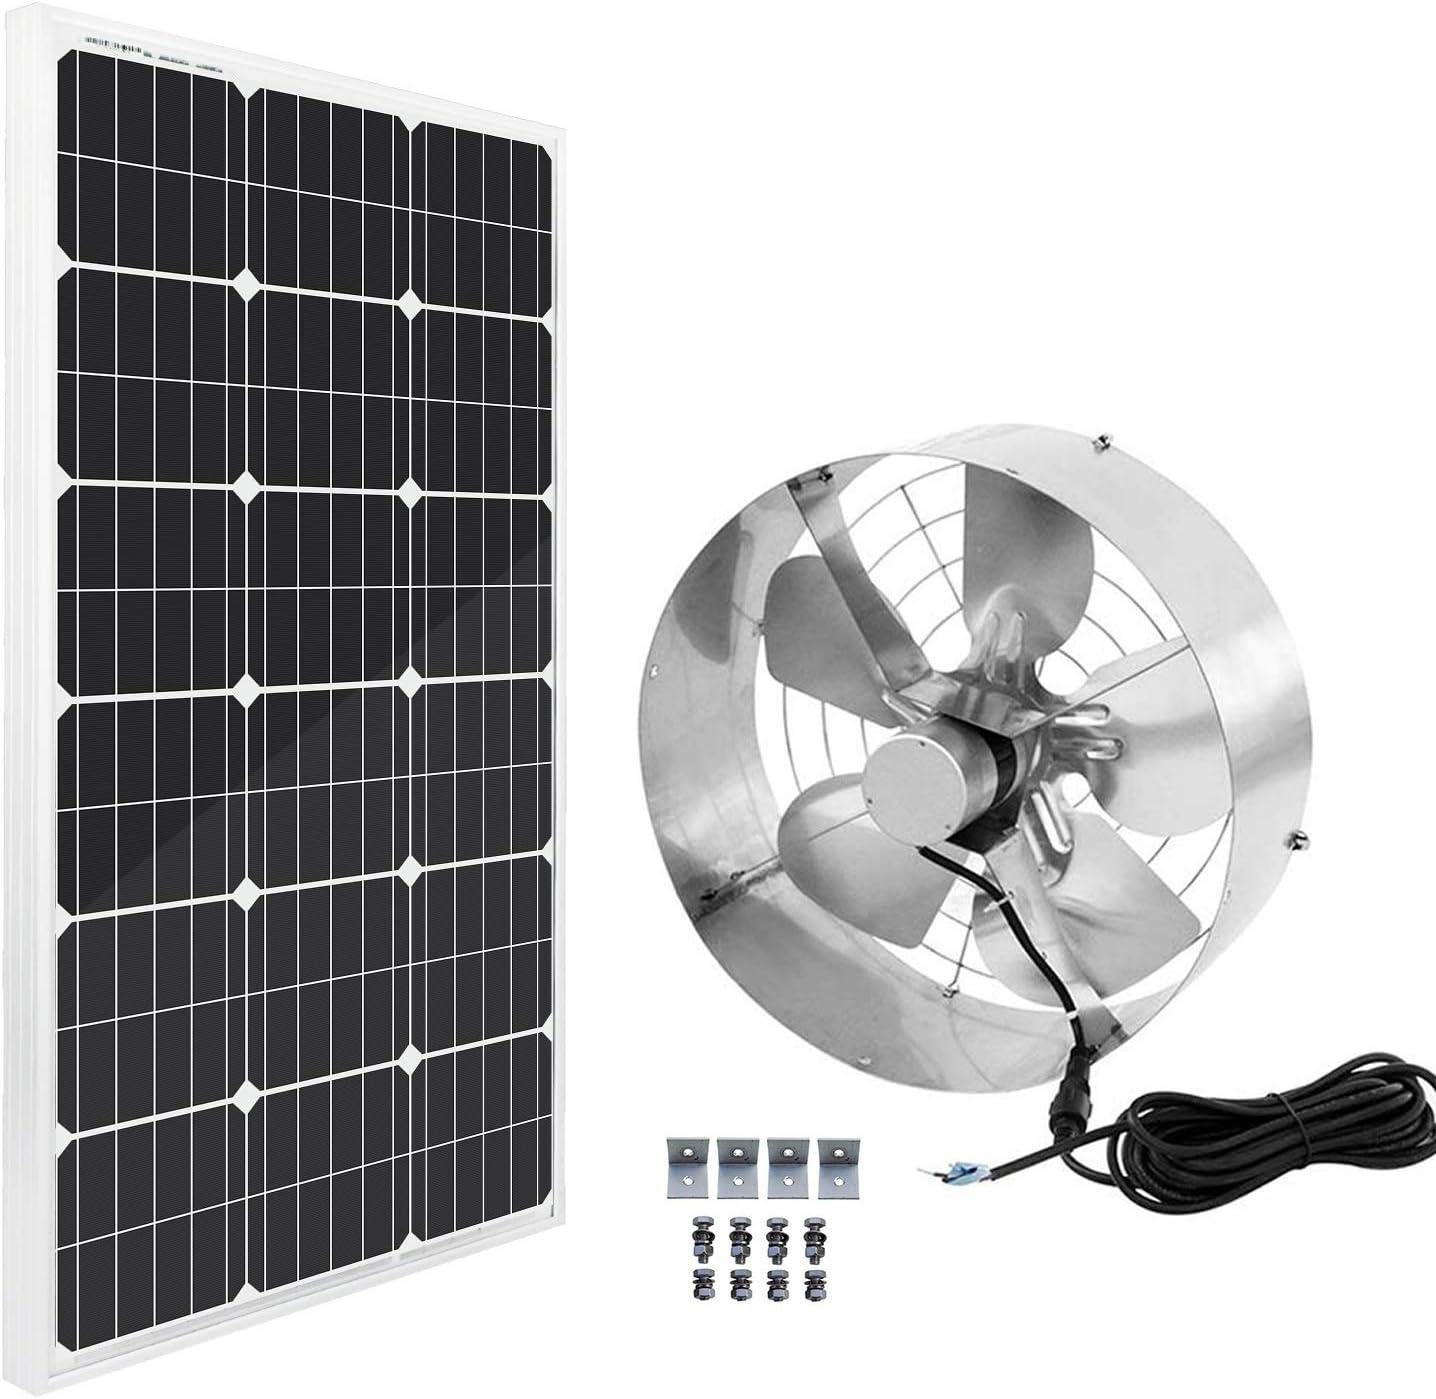 ECO-WORTHY Solar Power Attic 返品交換不可 Gable Fan 100 w - 新生活 Panel Watts